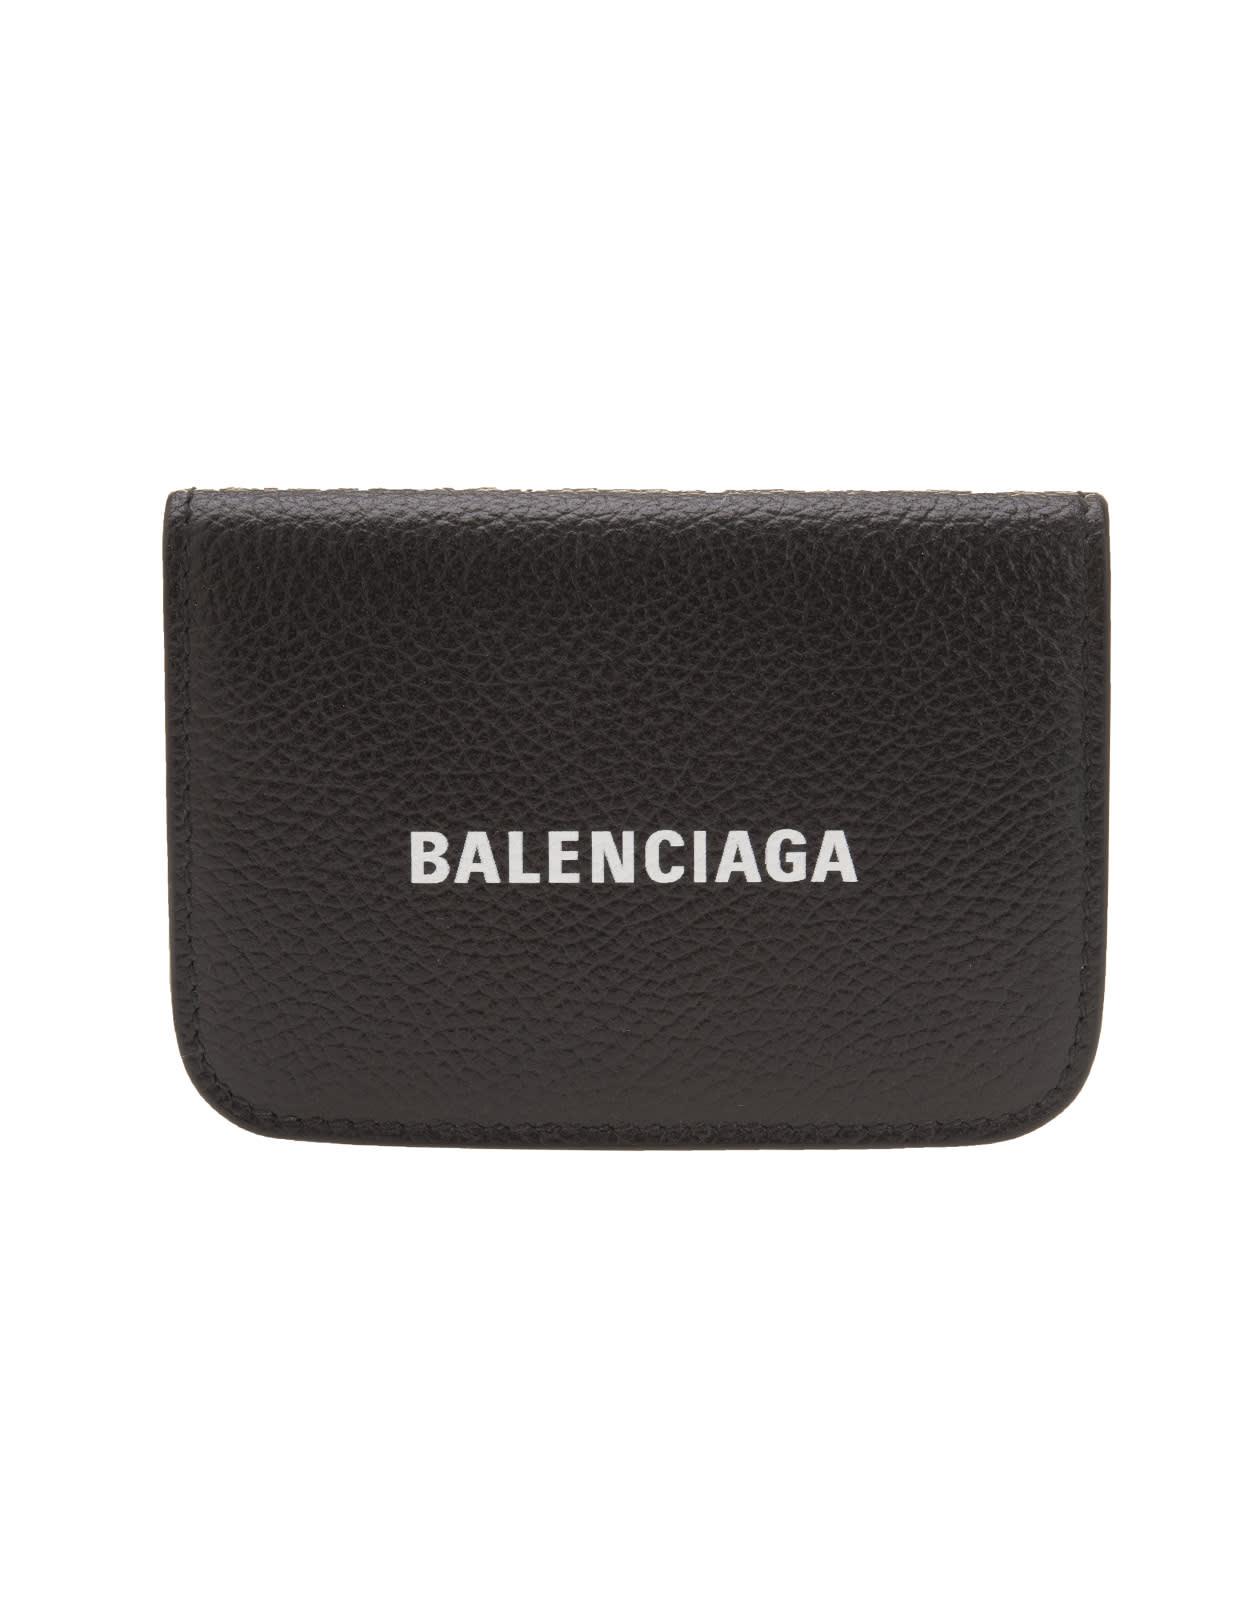 Balenciaga BLACK CASH MINI WALLET